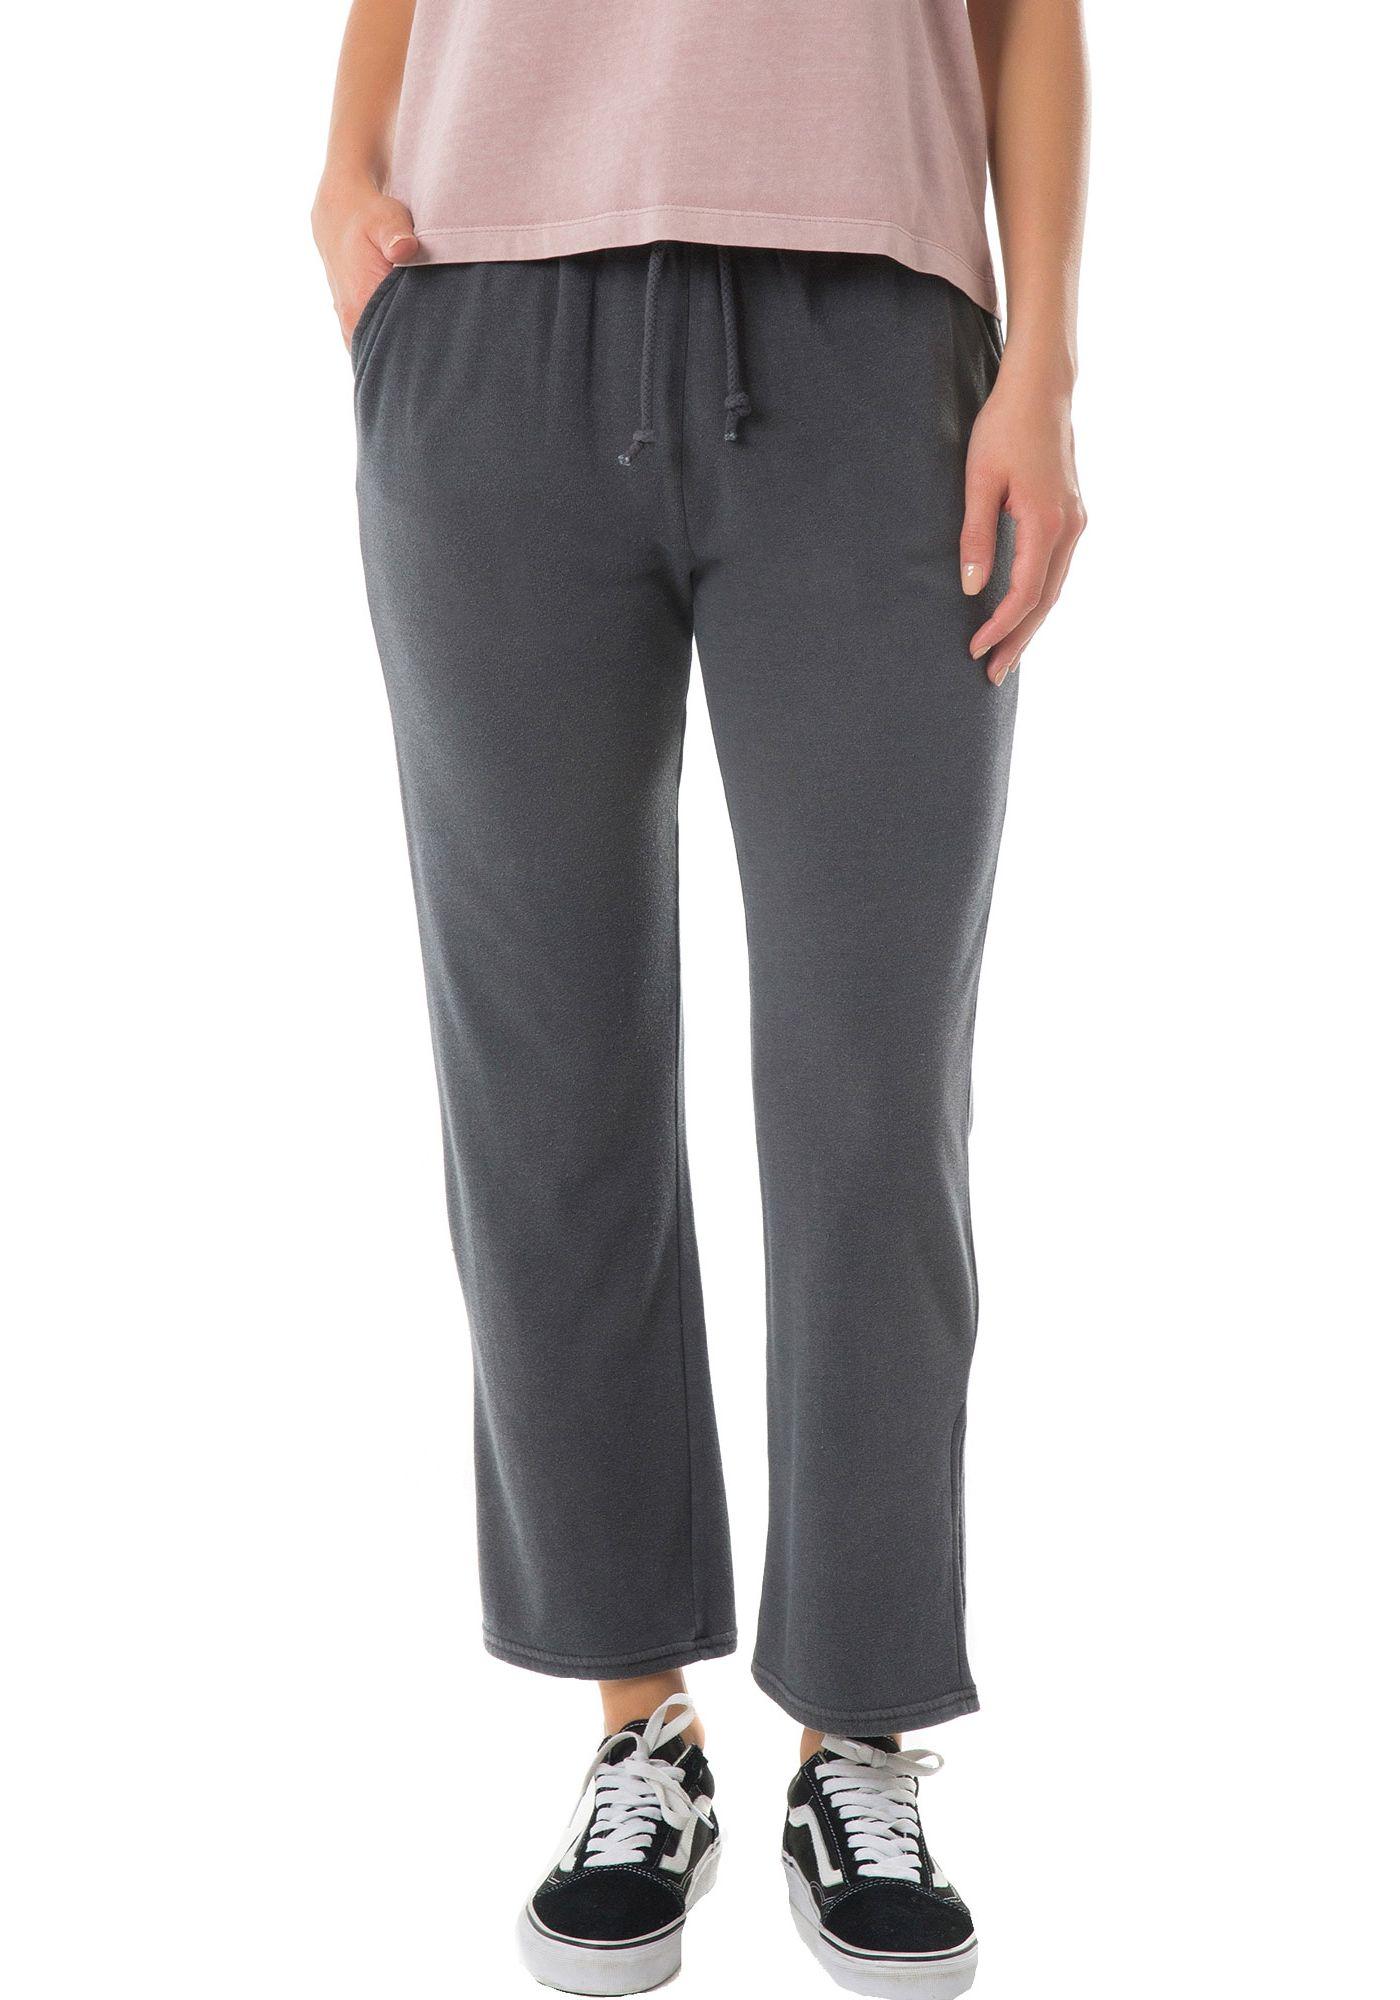 O'Neill Women's Sunray Fleece Pants